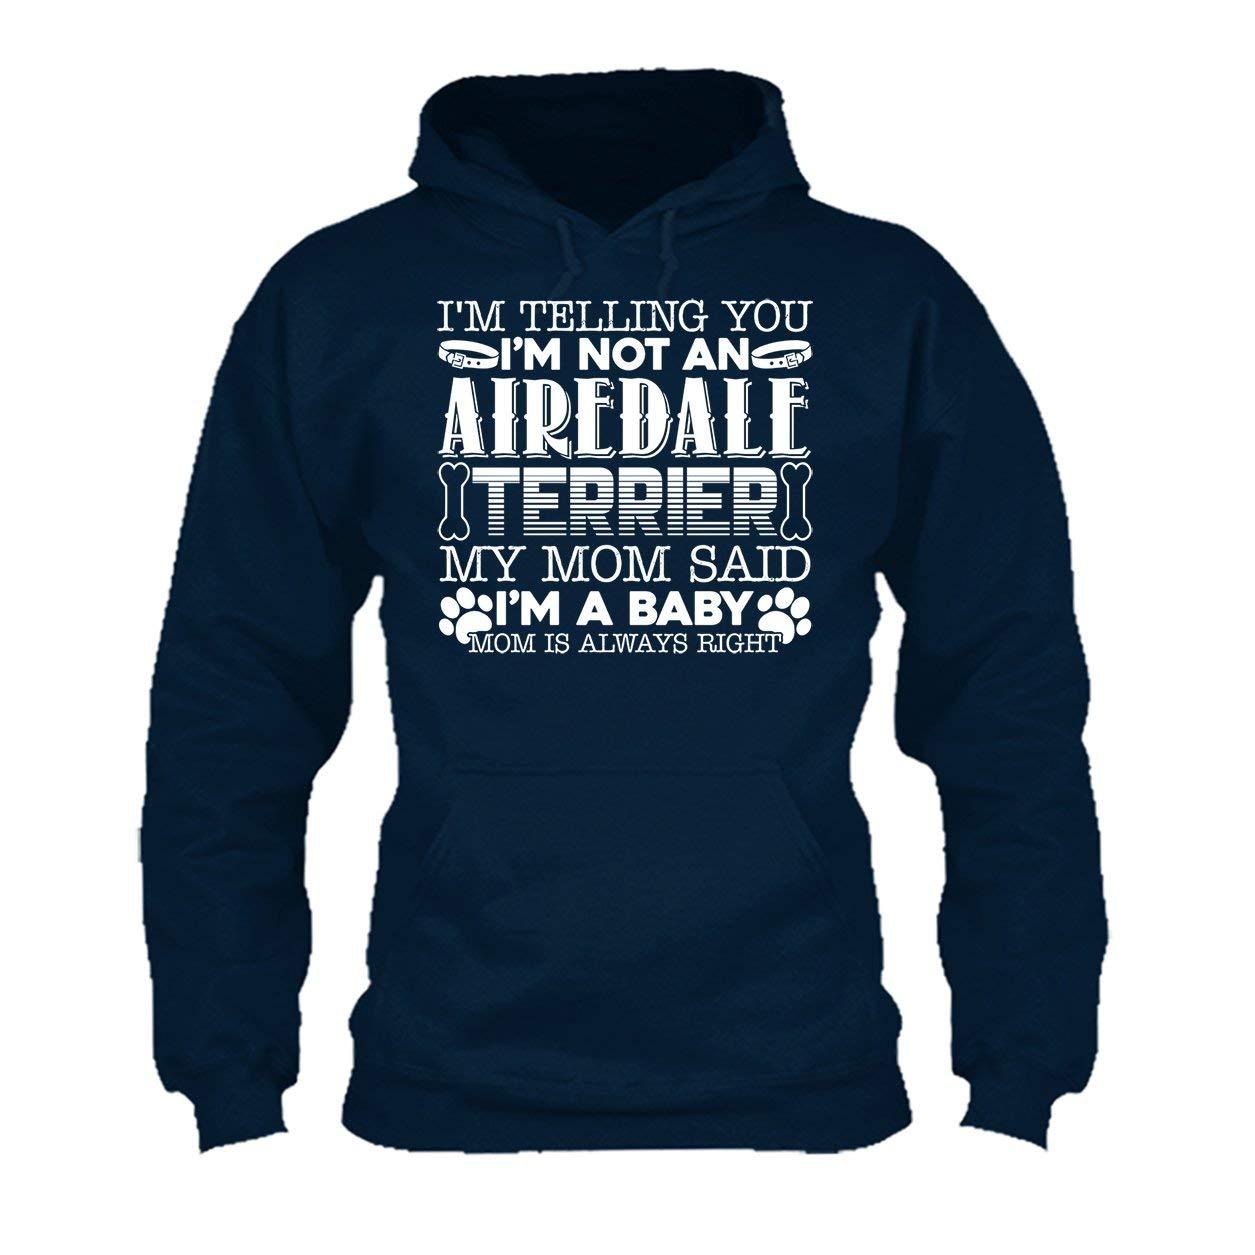 Hoodies Shirt Airedale Terrier Baby Tee Shirt